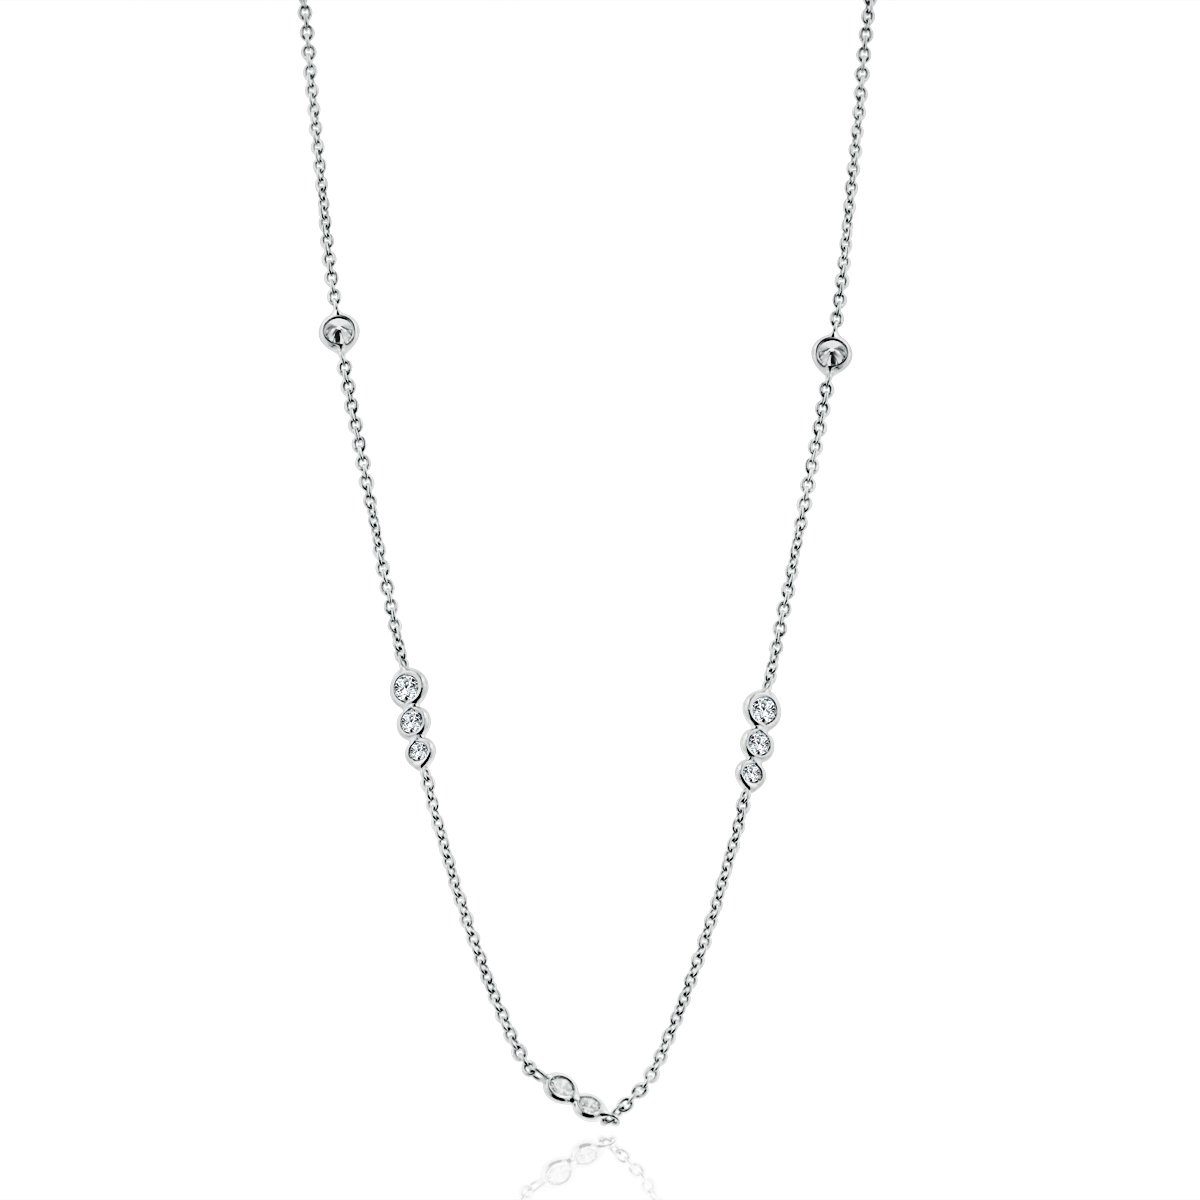 bf39a57599a Arthurs Collection 18K - White Gold Diamond Necklaces. Designer ...